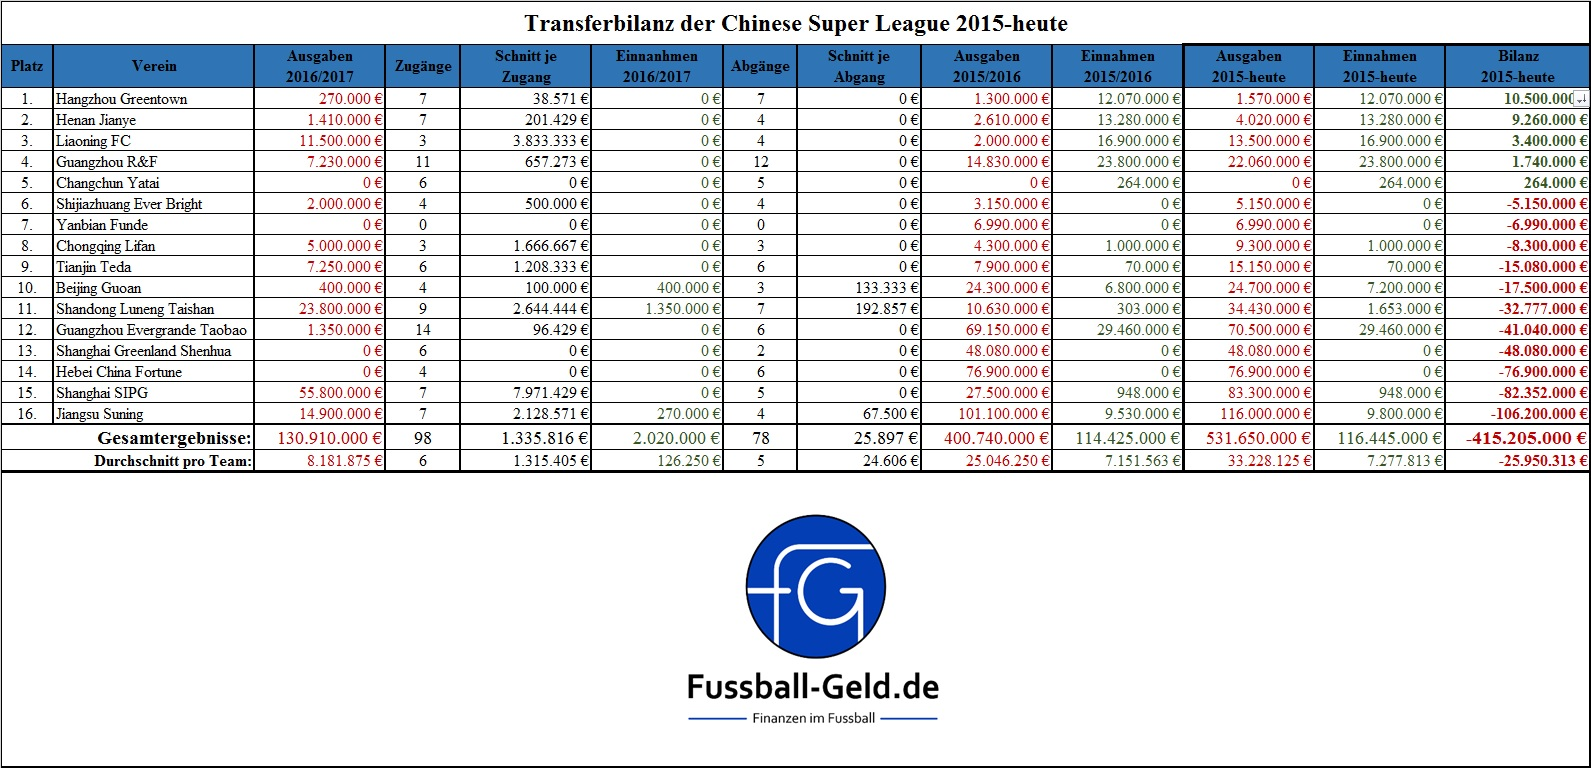 transferbilanz-chinese-super-league